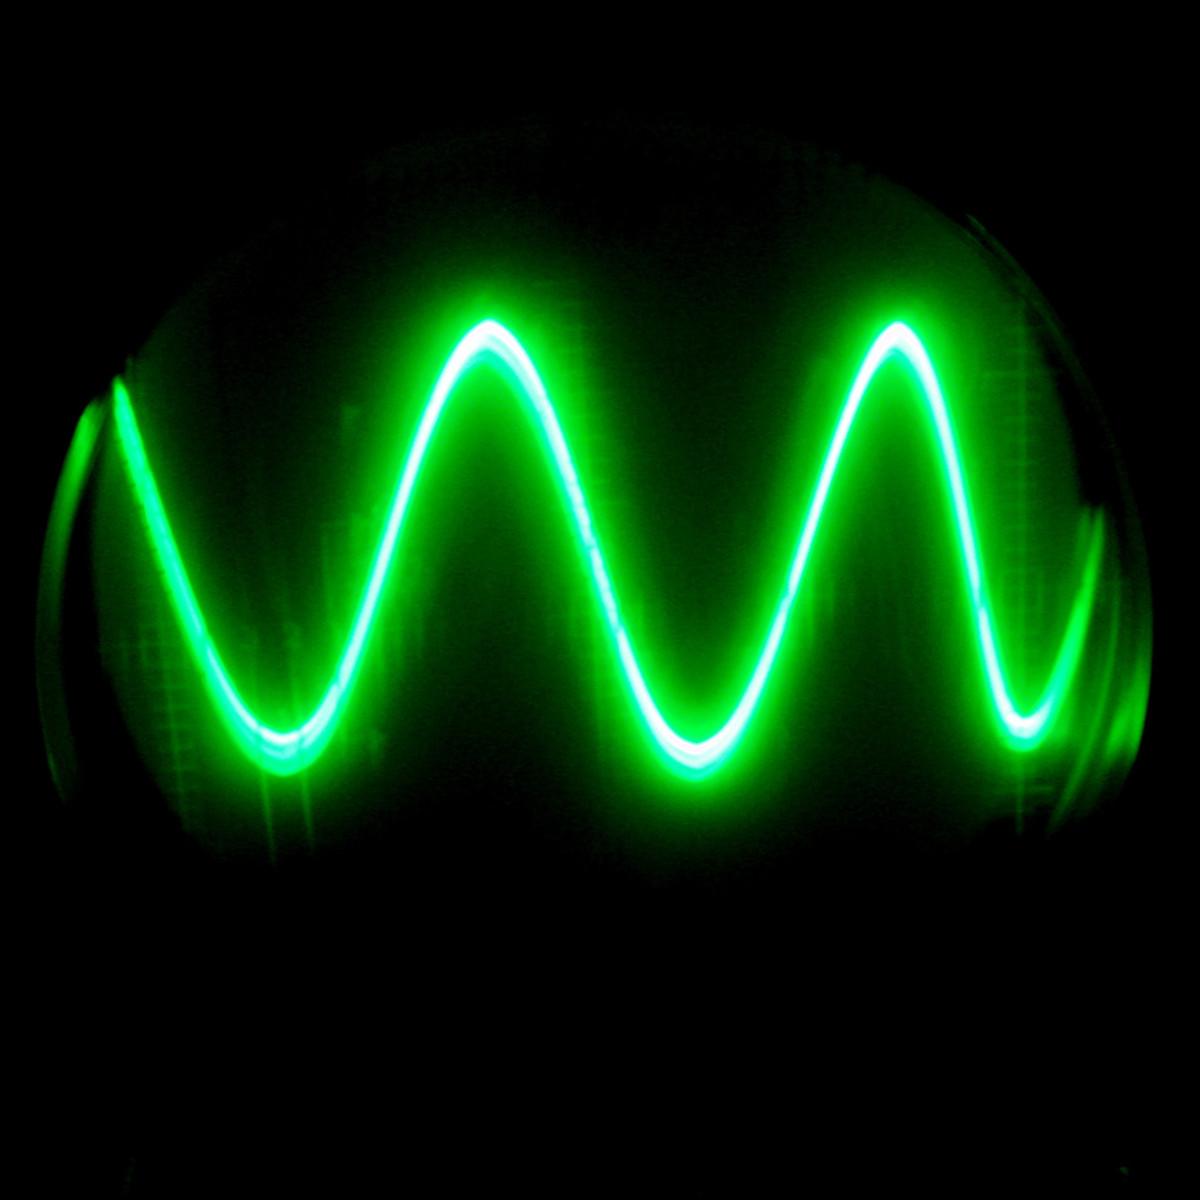 Best Portable and Handheld Digital Oscilloscopes: Reviews